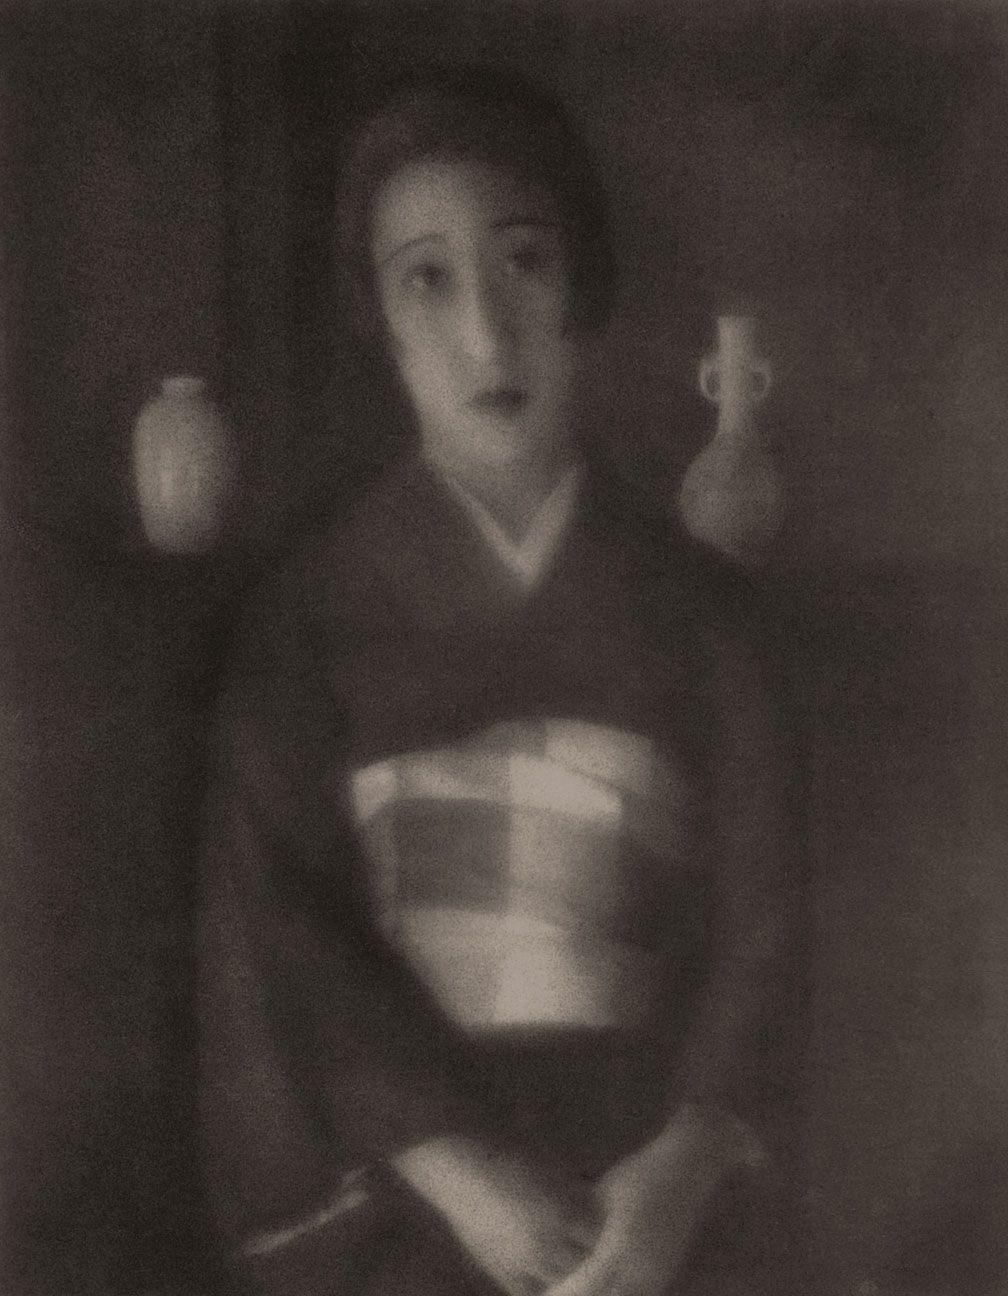 Takayama Masataka 高山正隆 (18...